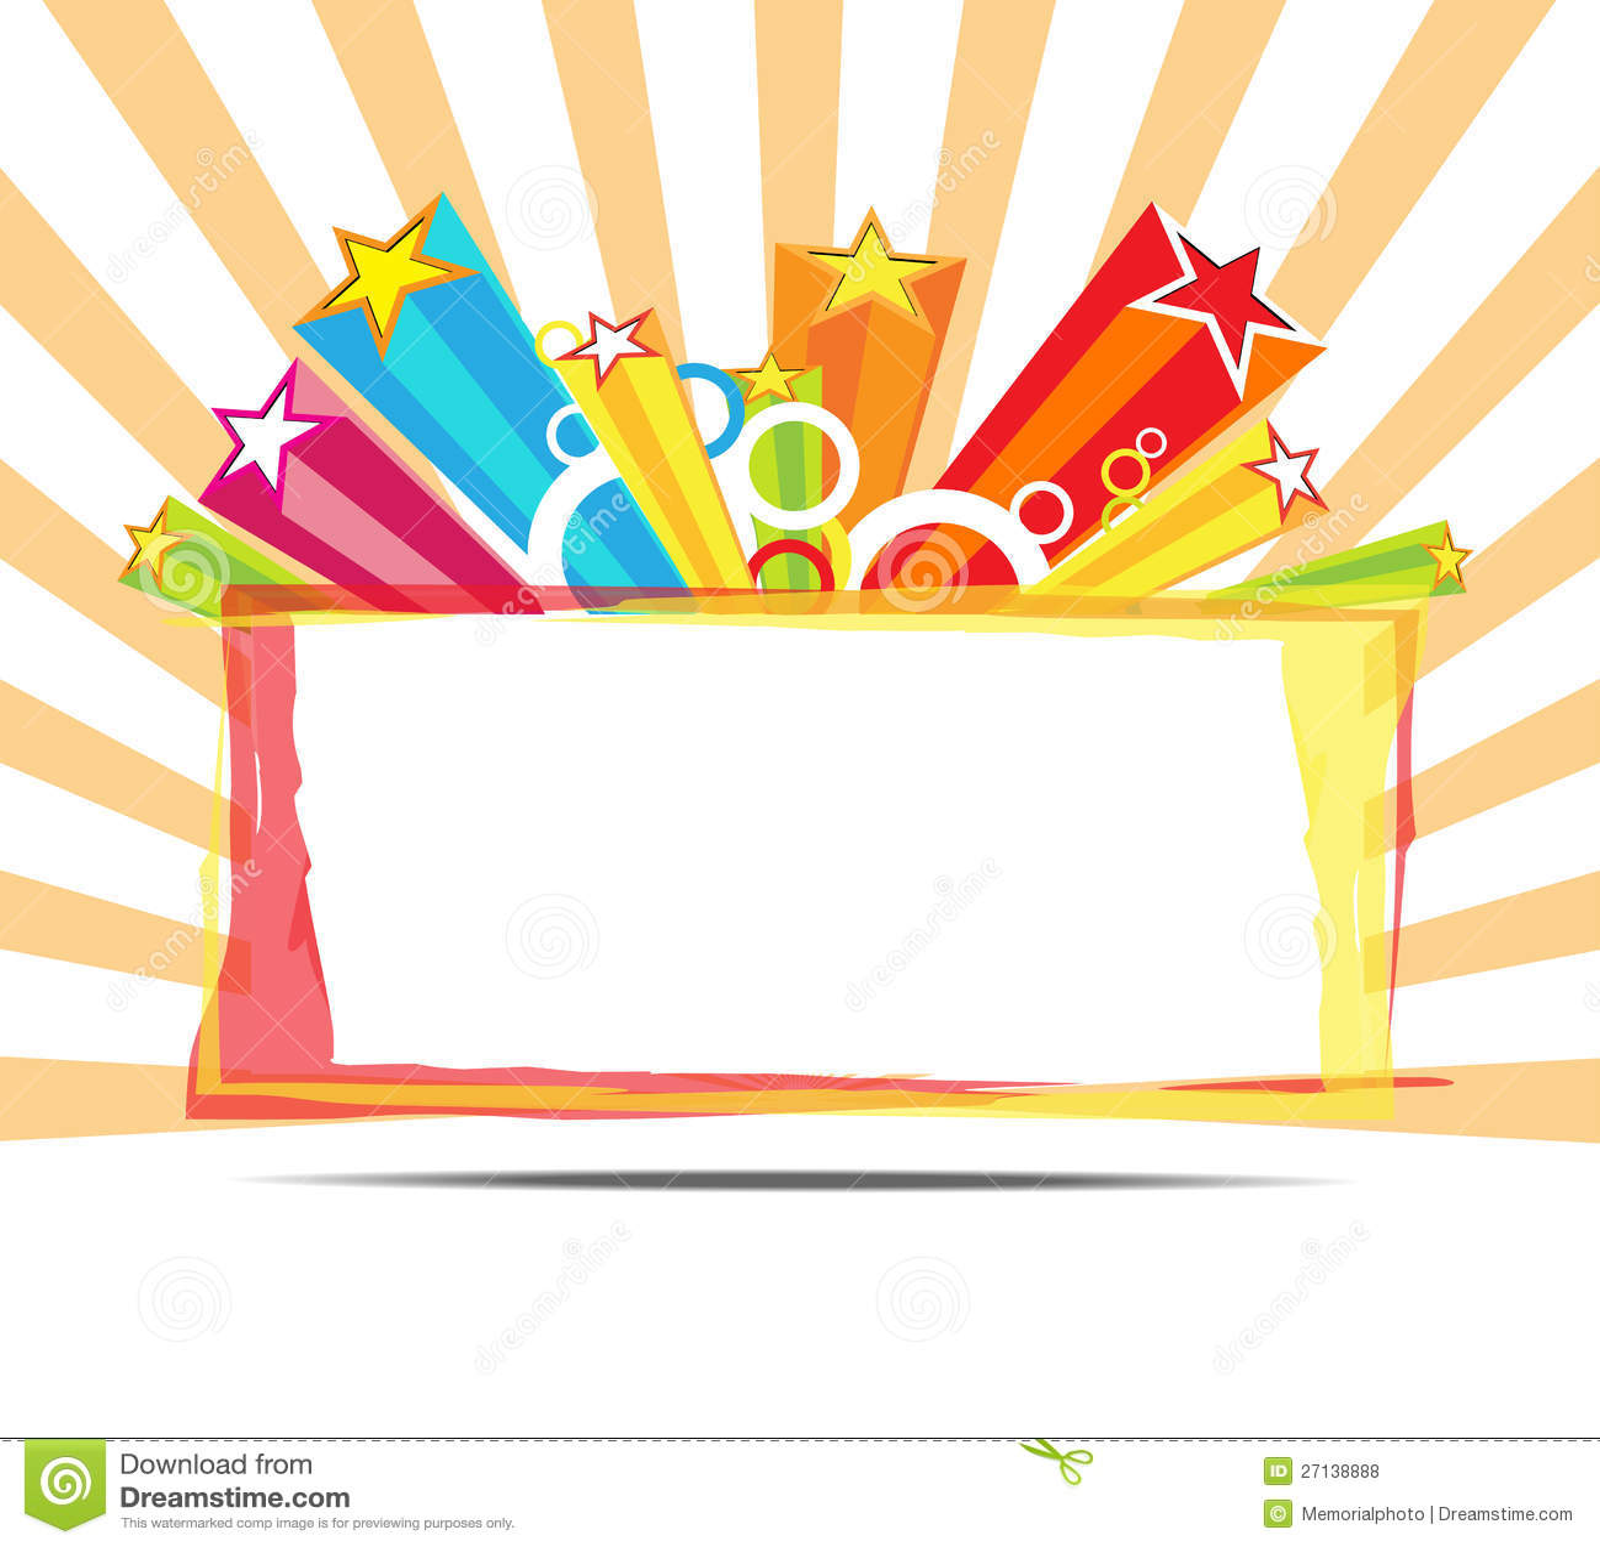 Celebrate decoration background stock vector for Background decoration